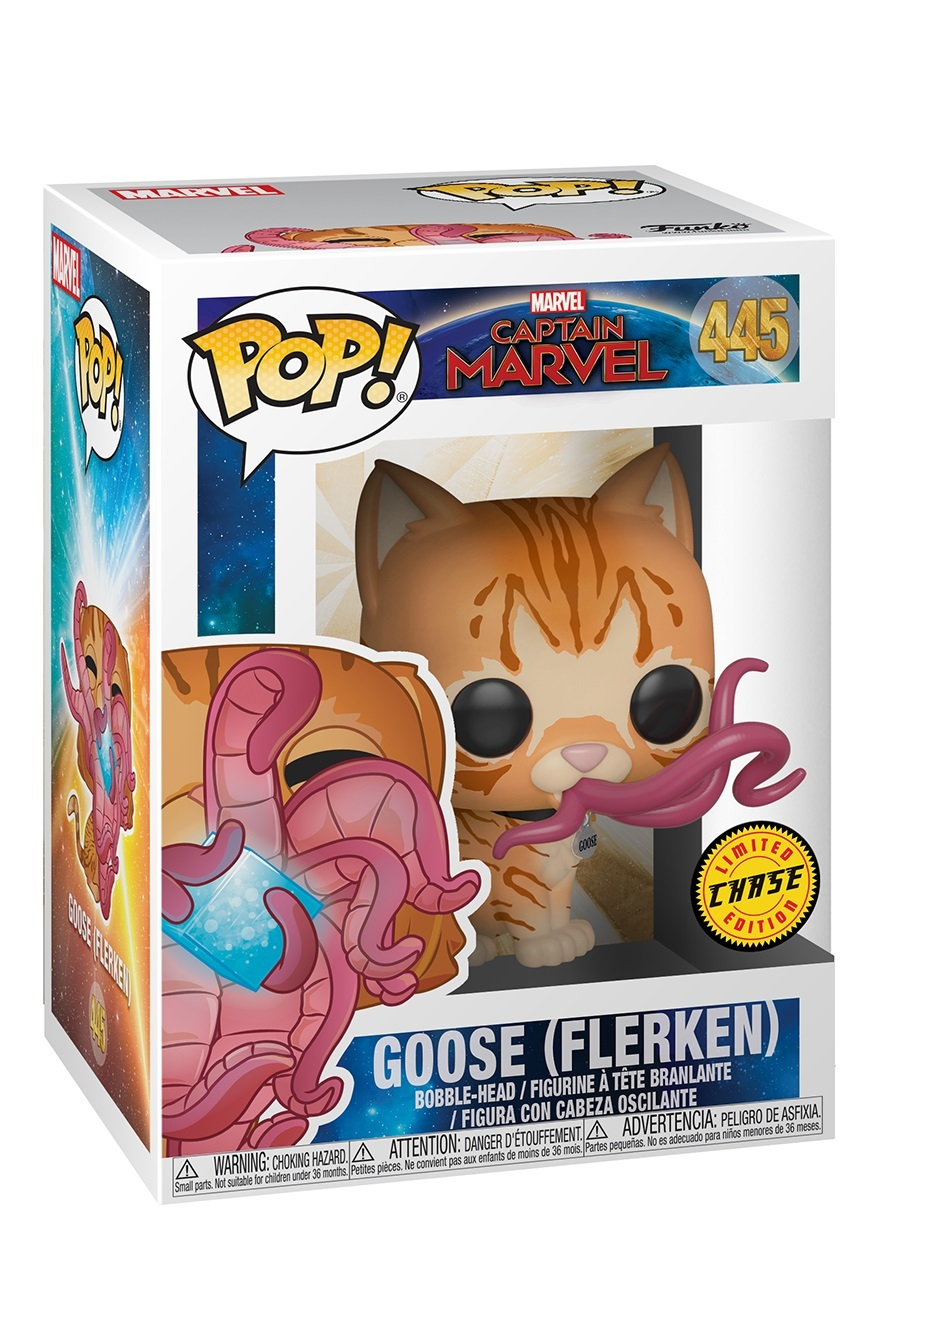 Captain Marvel - Goose the Cat (Flerken) Pop! Vinyl Figure (with a chance for a Chase version!) image